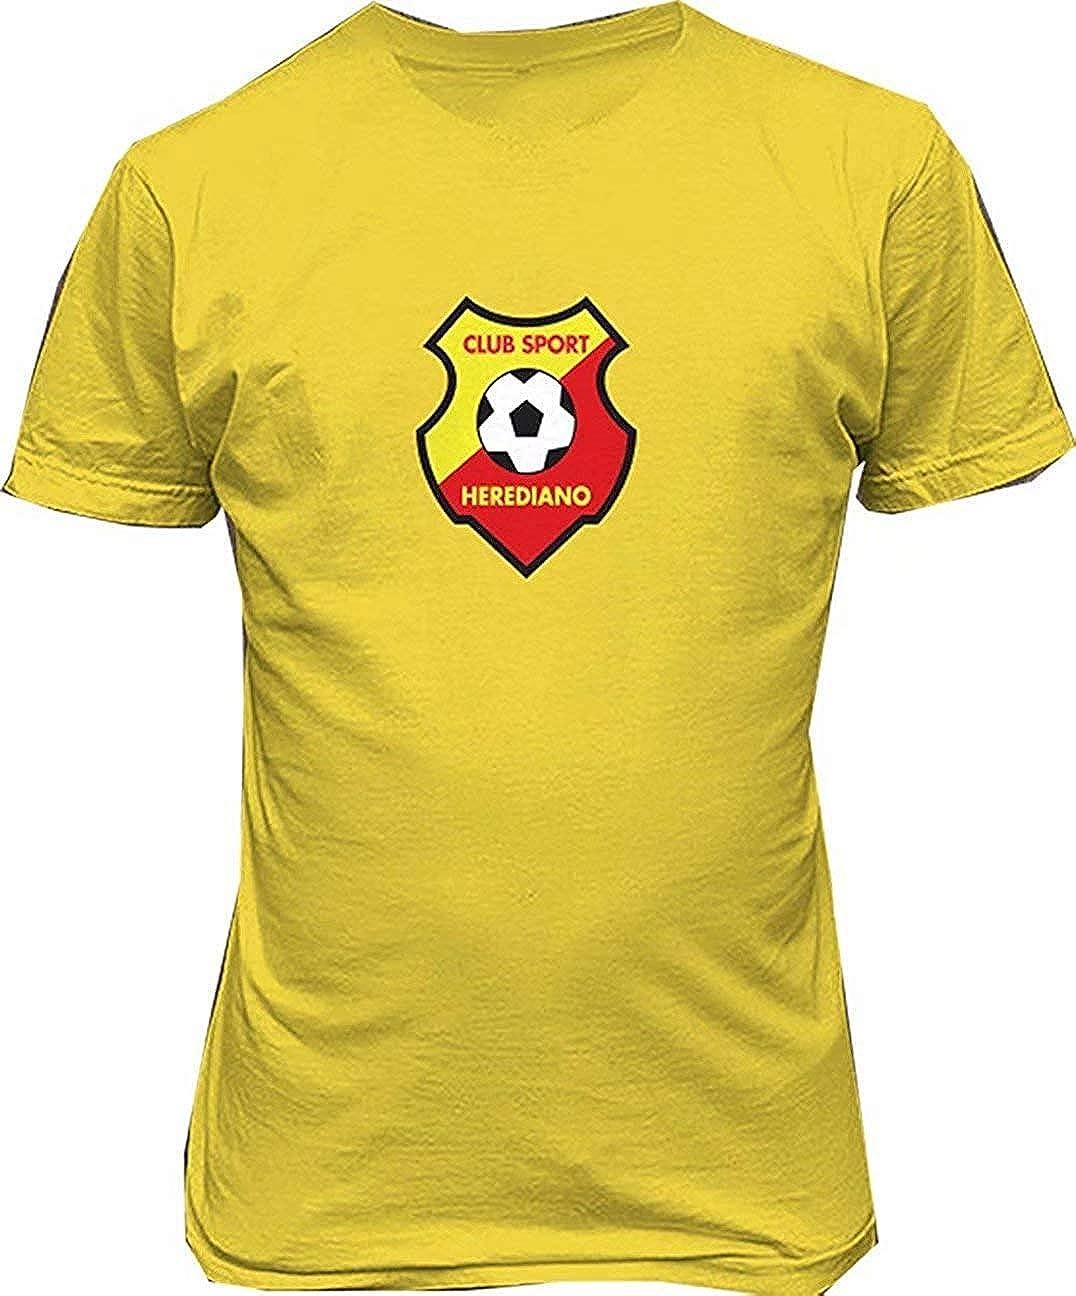 Forww Camiseta de fútbol Club Sport Herediano Costa Rica ...